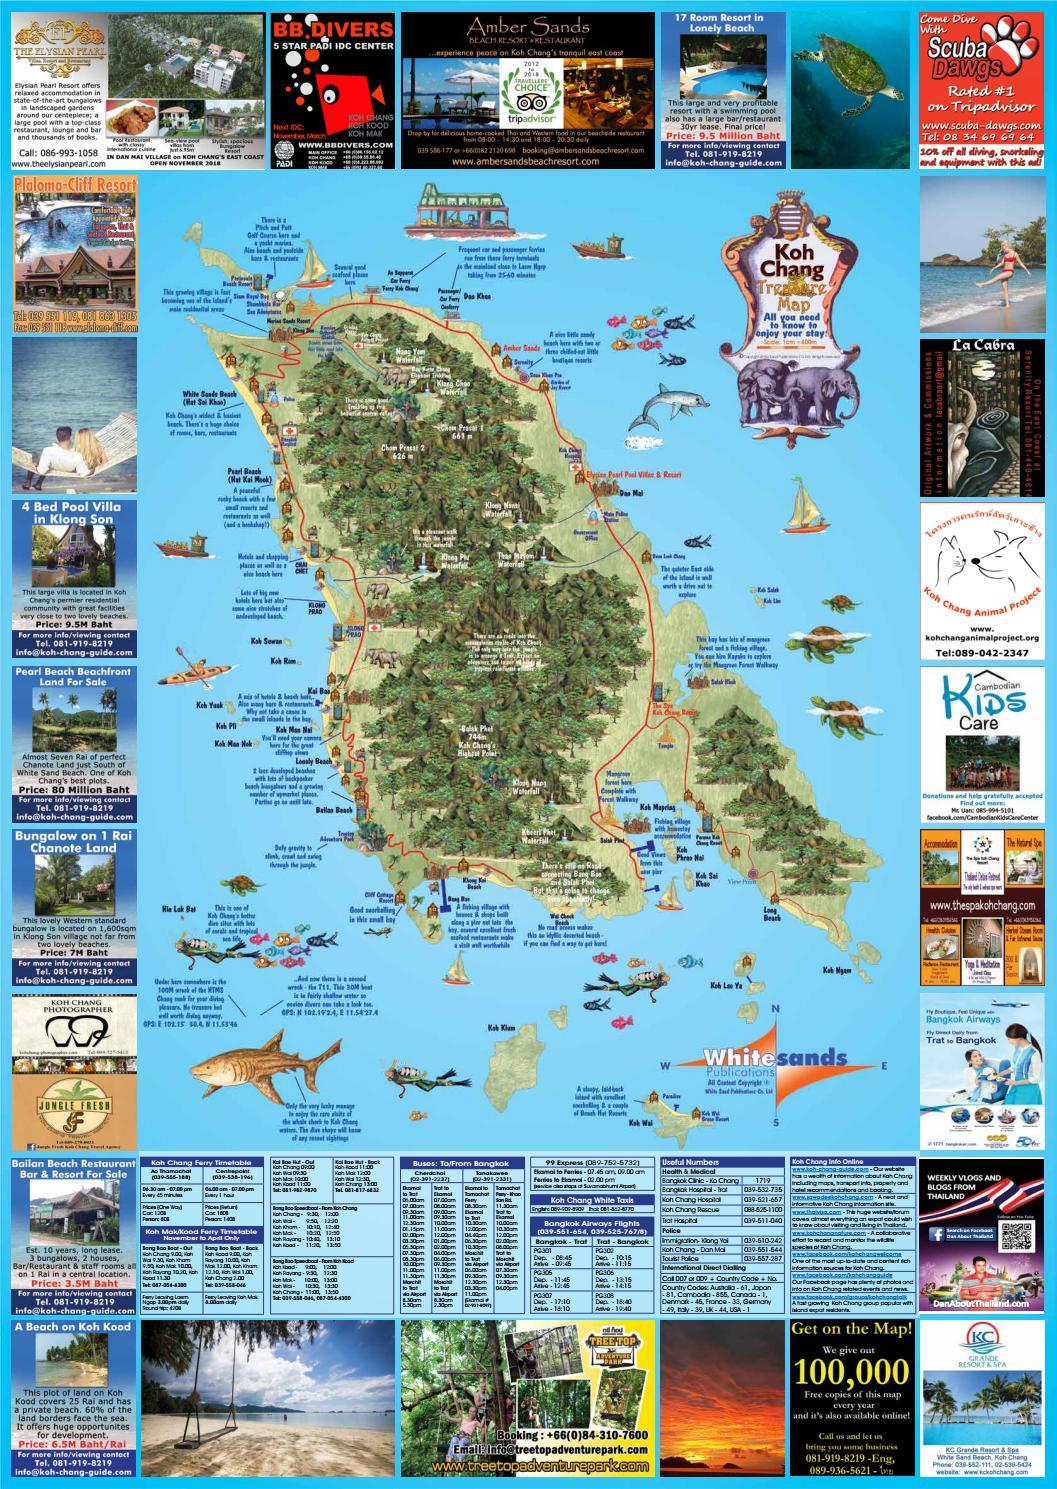 Koh Chang Treasure Map October 2018 by The Koh Chang Guide